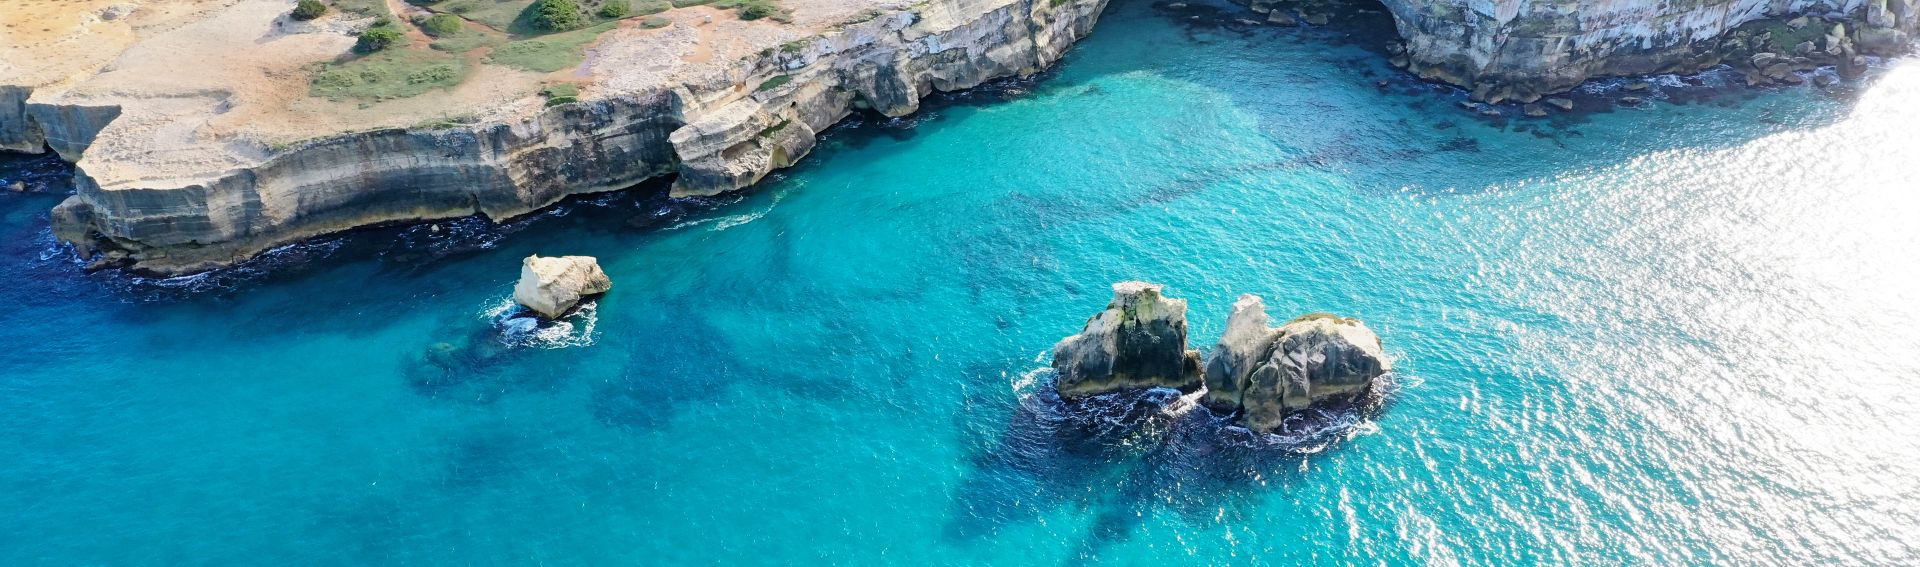 Province de Lecce & Salento